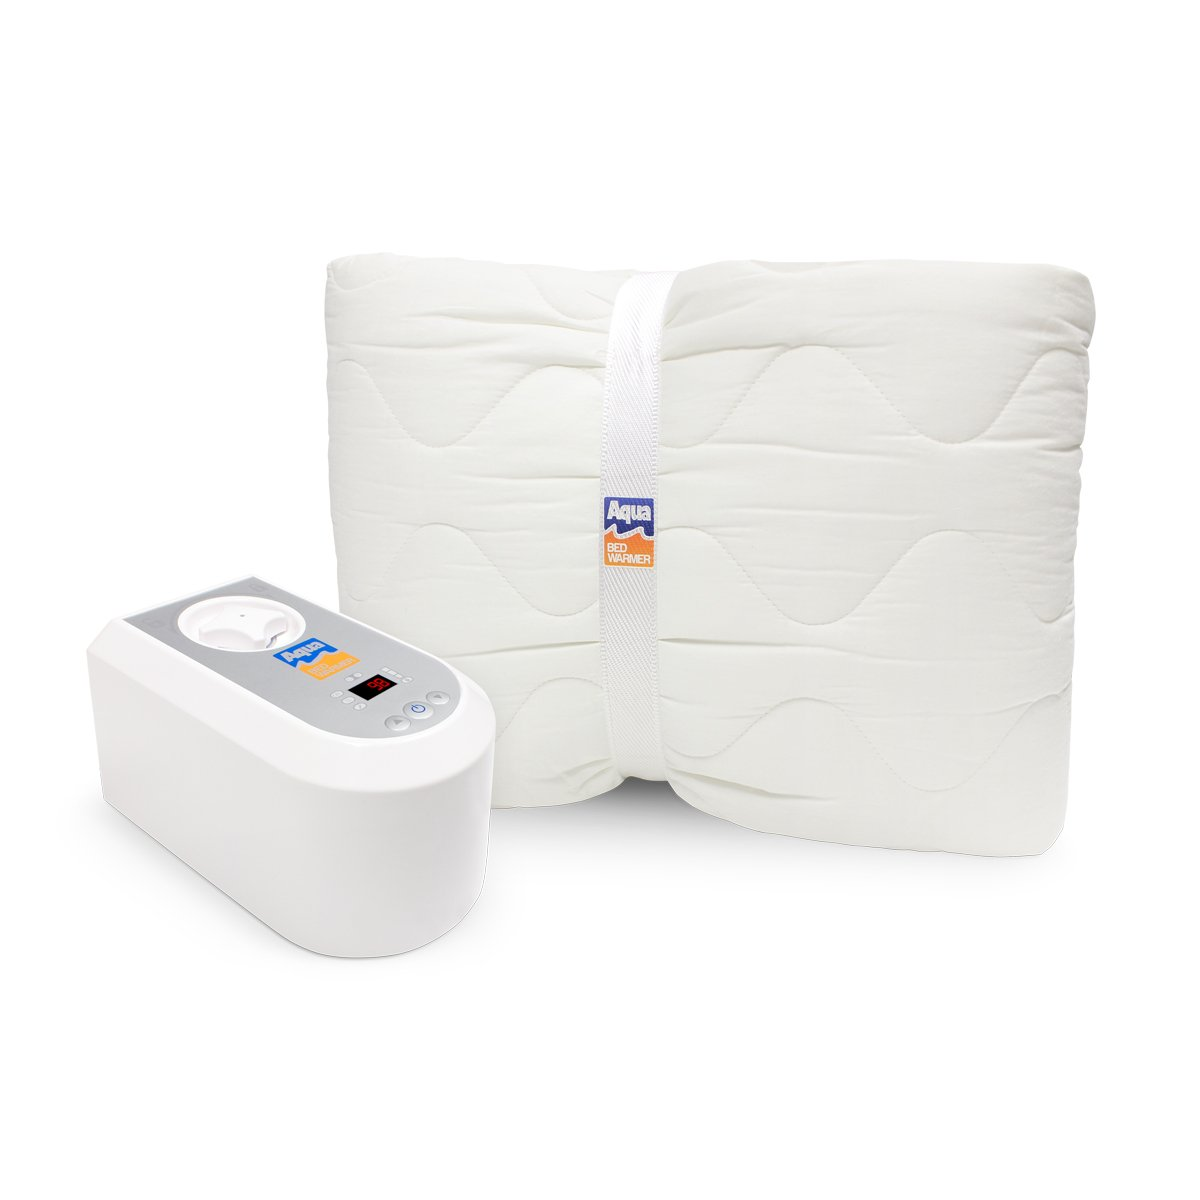 mattress heater. amazon.com: aqua bed warmer non-electric heater blanket (twin): home \u0026 kitchen mattress c